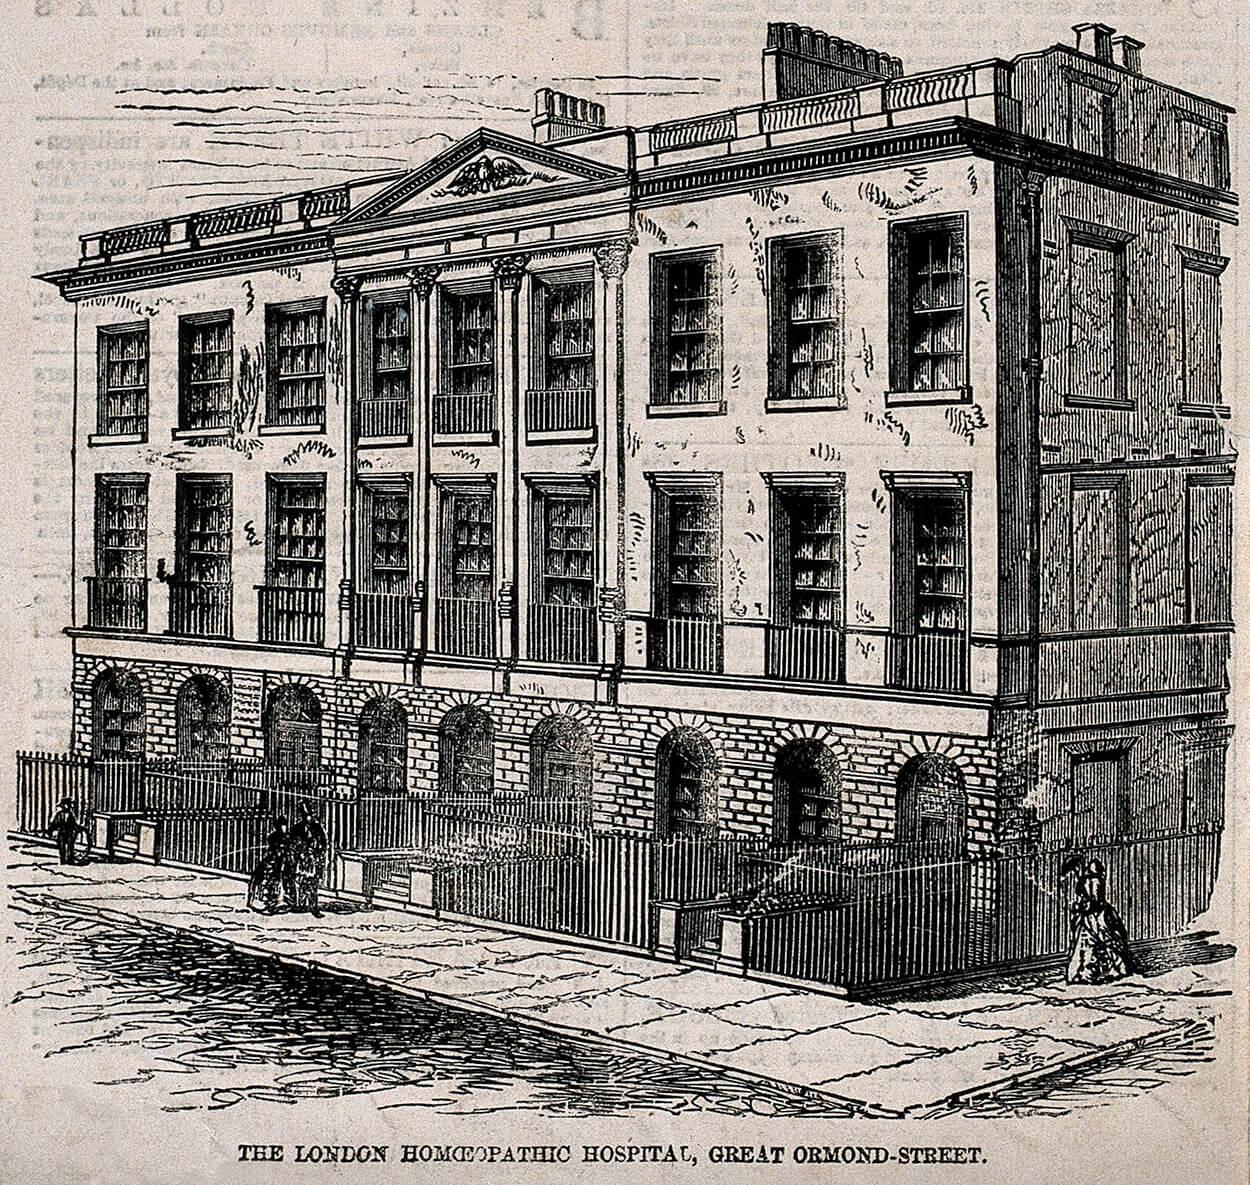 Royal London Homeopathic Hospital